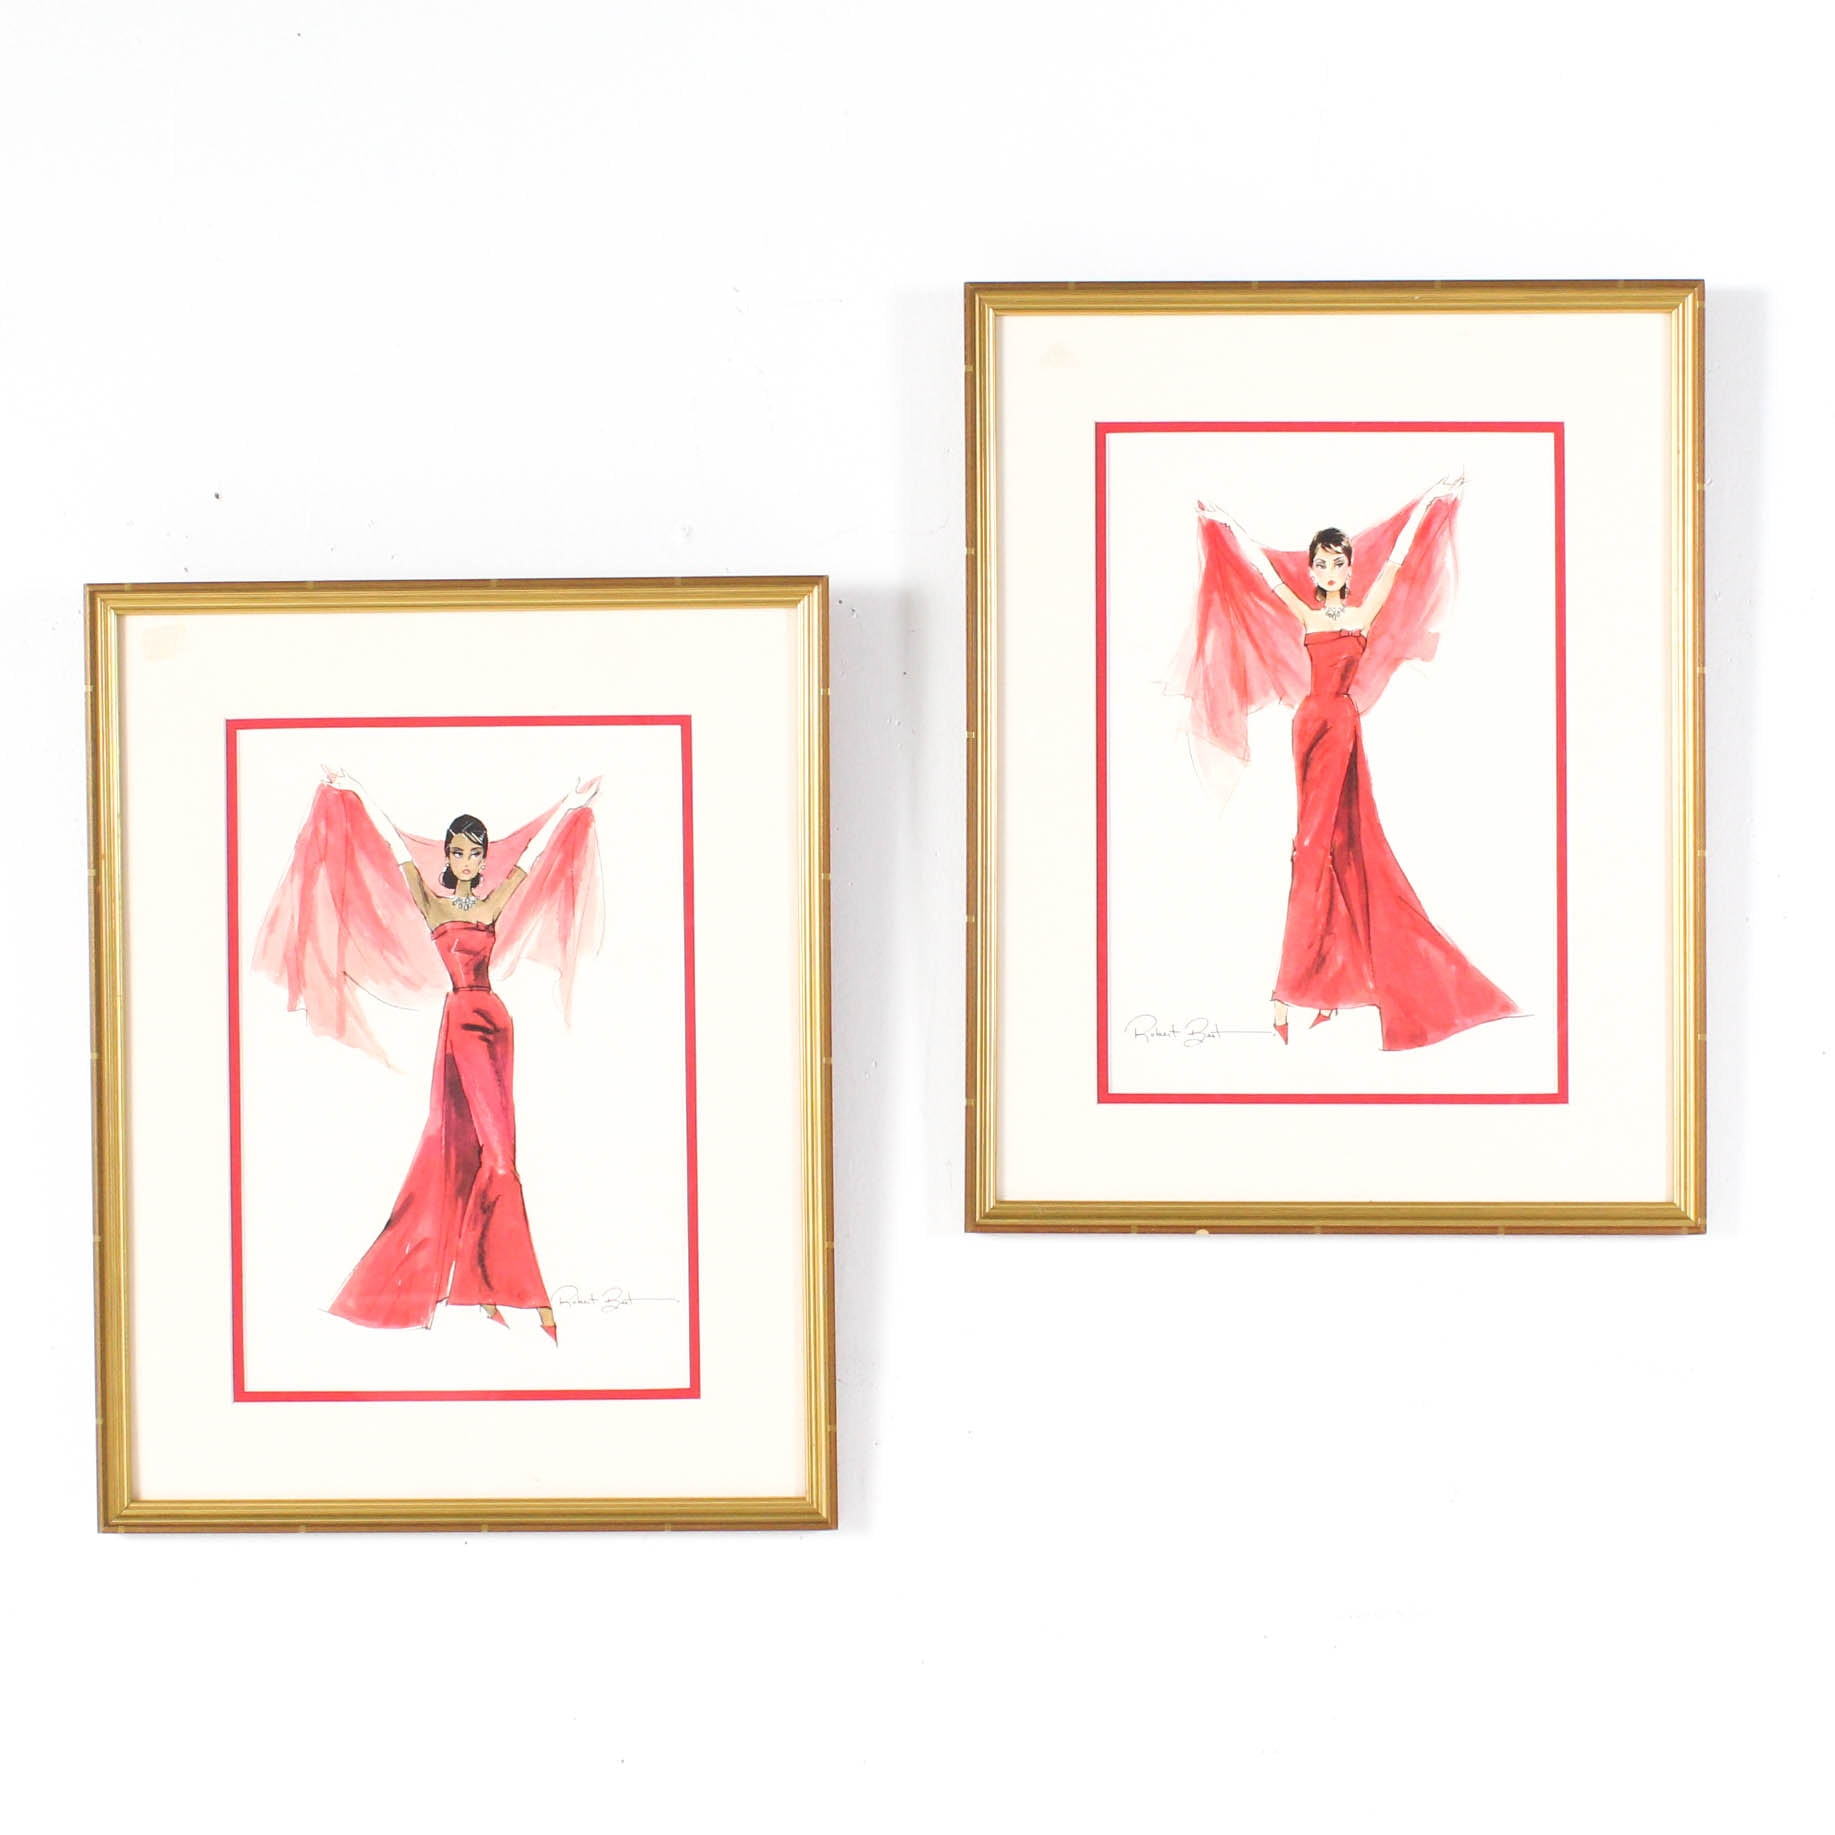 Offset Lithograph Fashion Prints after Robert Best